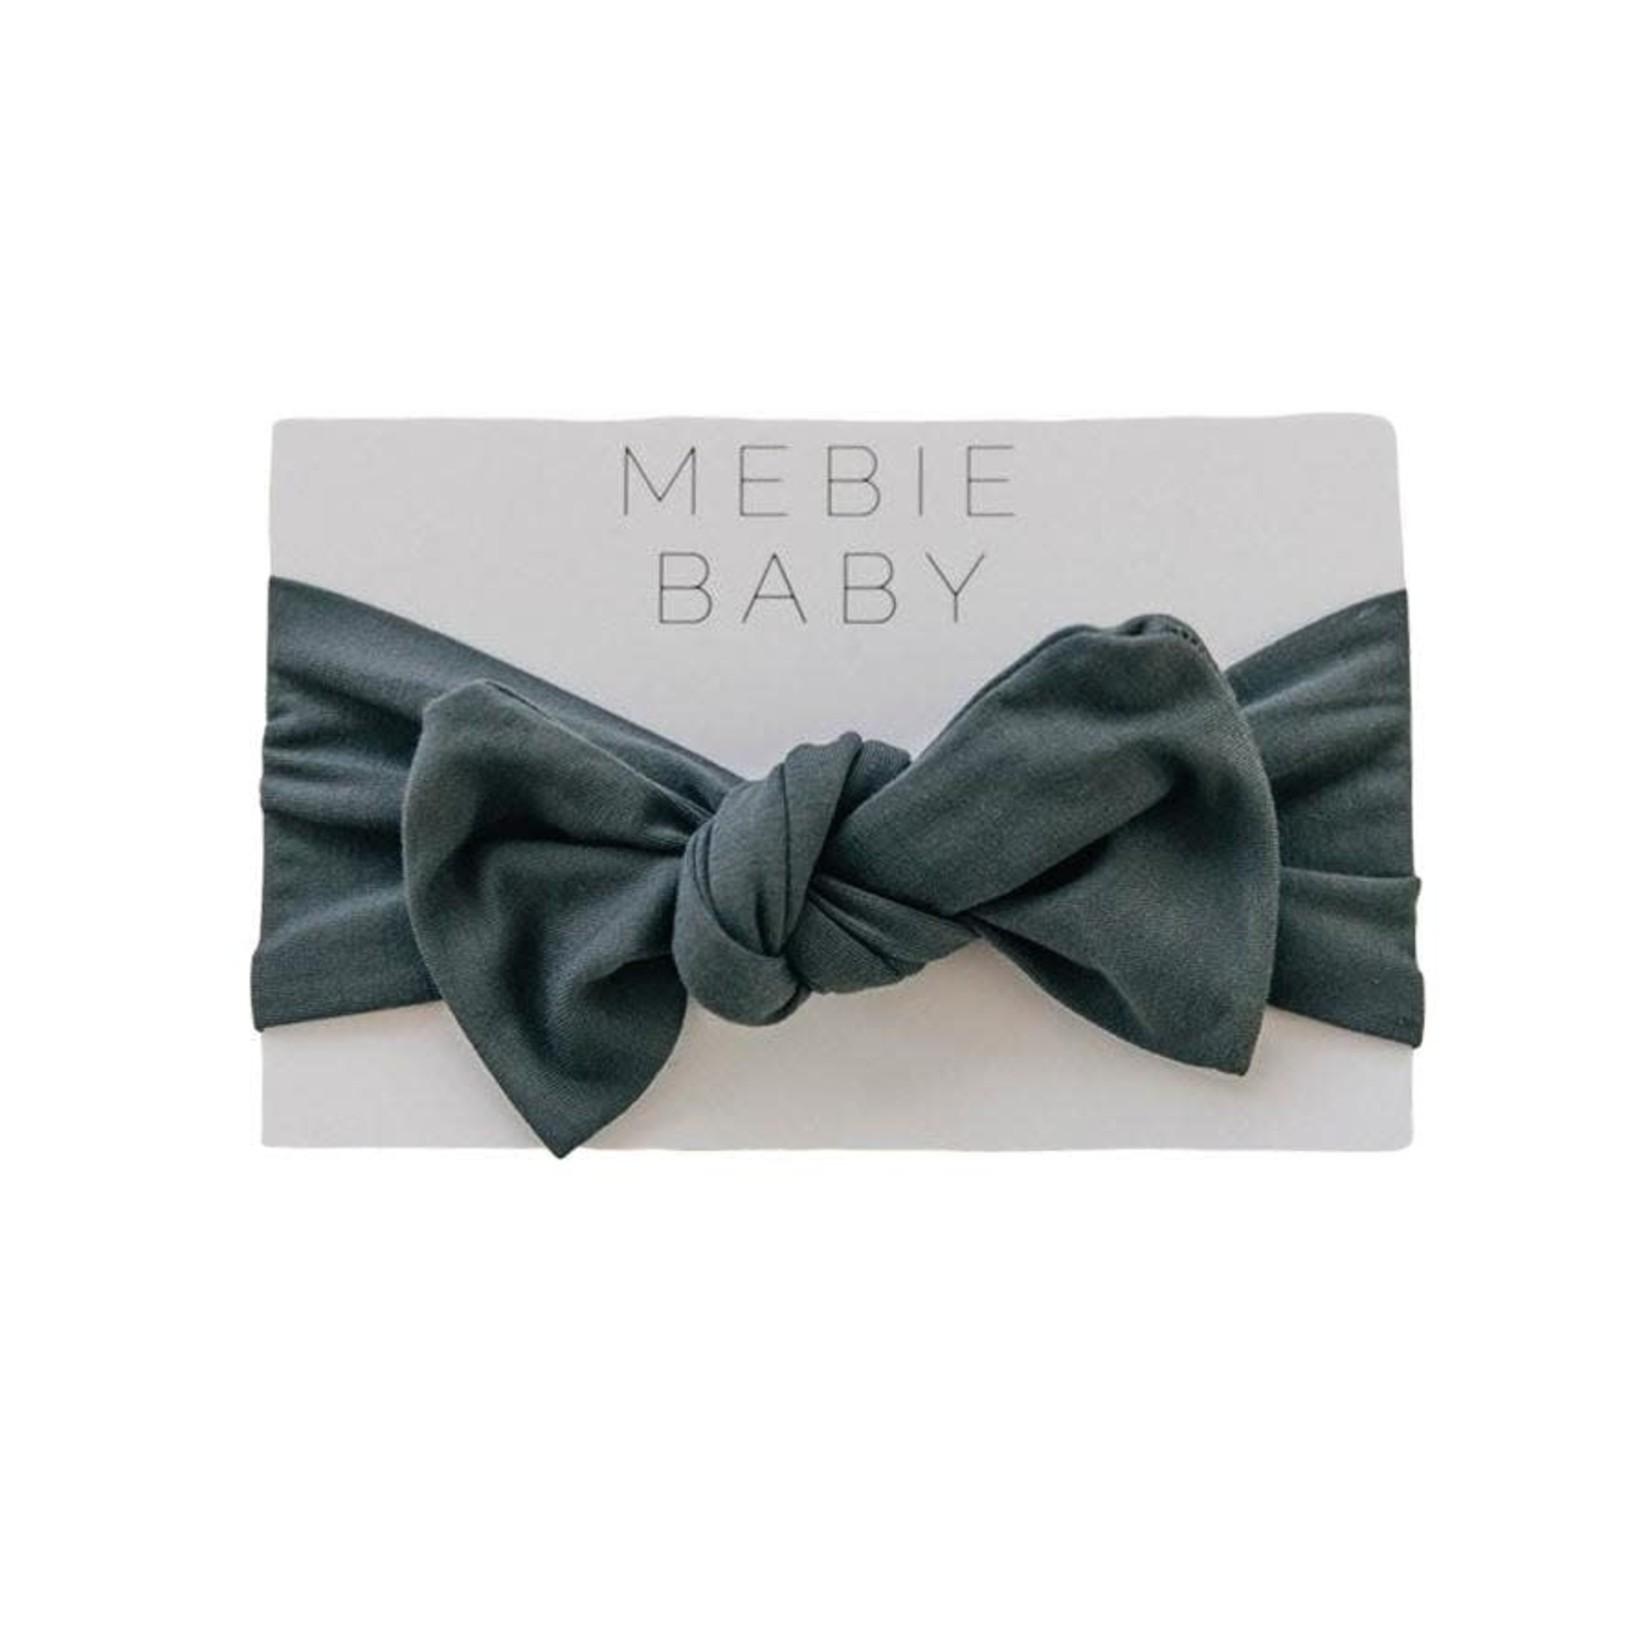 Mebie Baby Head Wrap - Charcoal